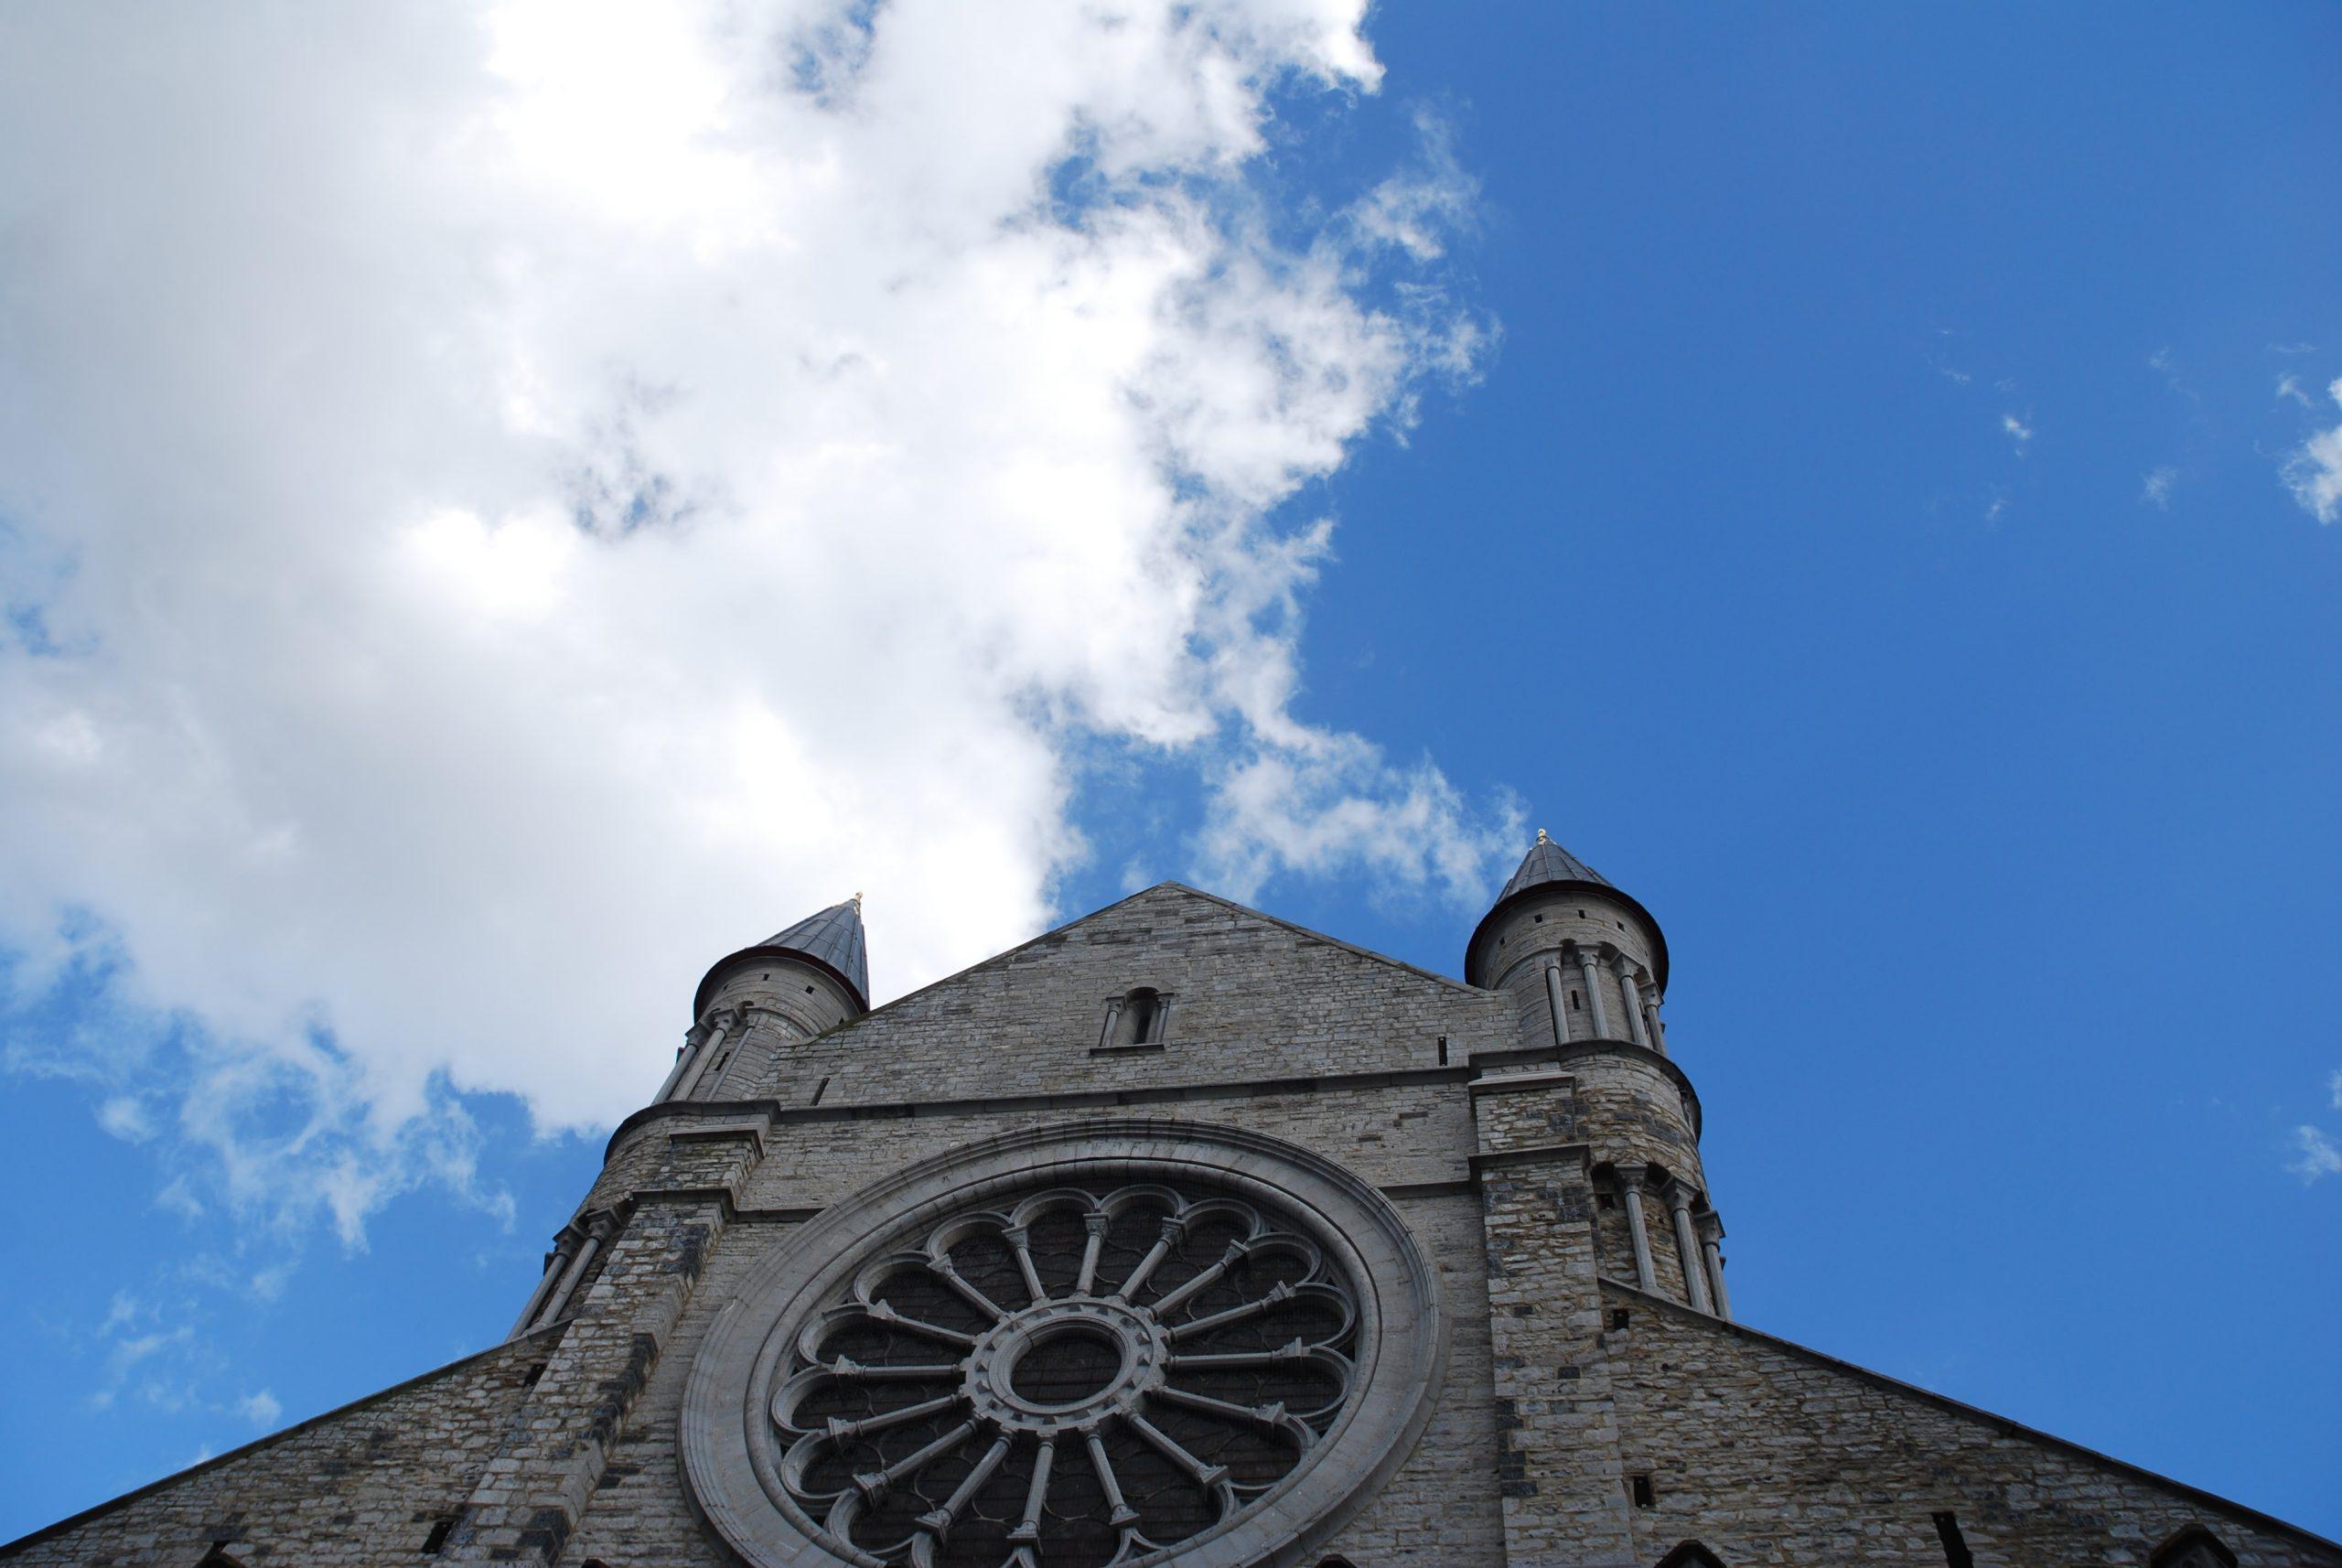 Cathédrale-tournai-Notre-Dame